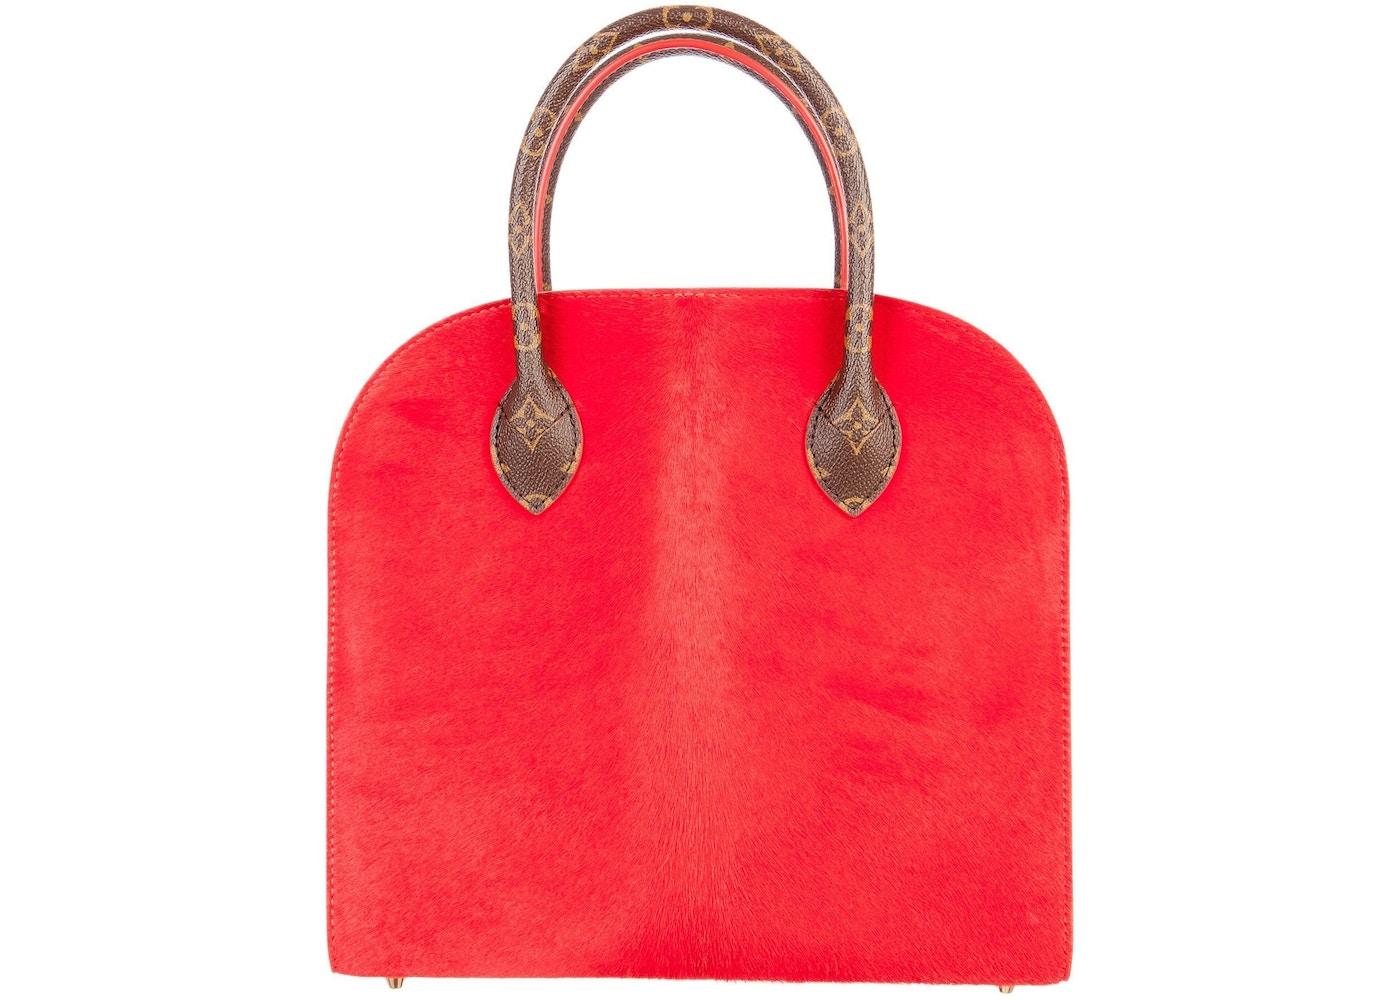 d8c876125ed Louis Vuitton x Christian Louboutin Iconoclast Tote Monogram Brown/Red